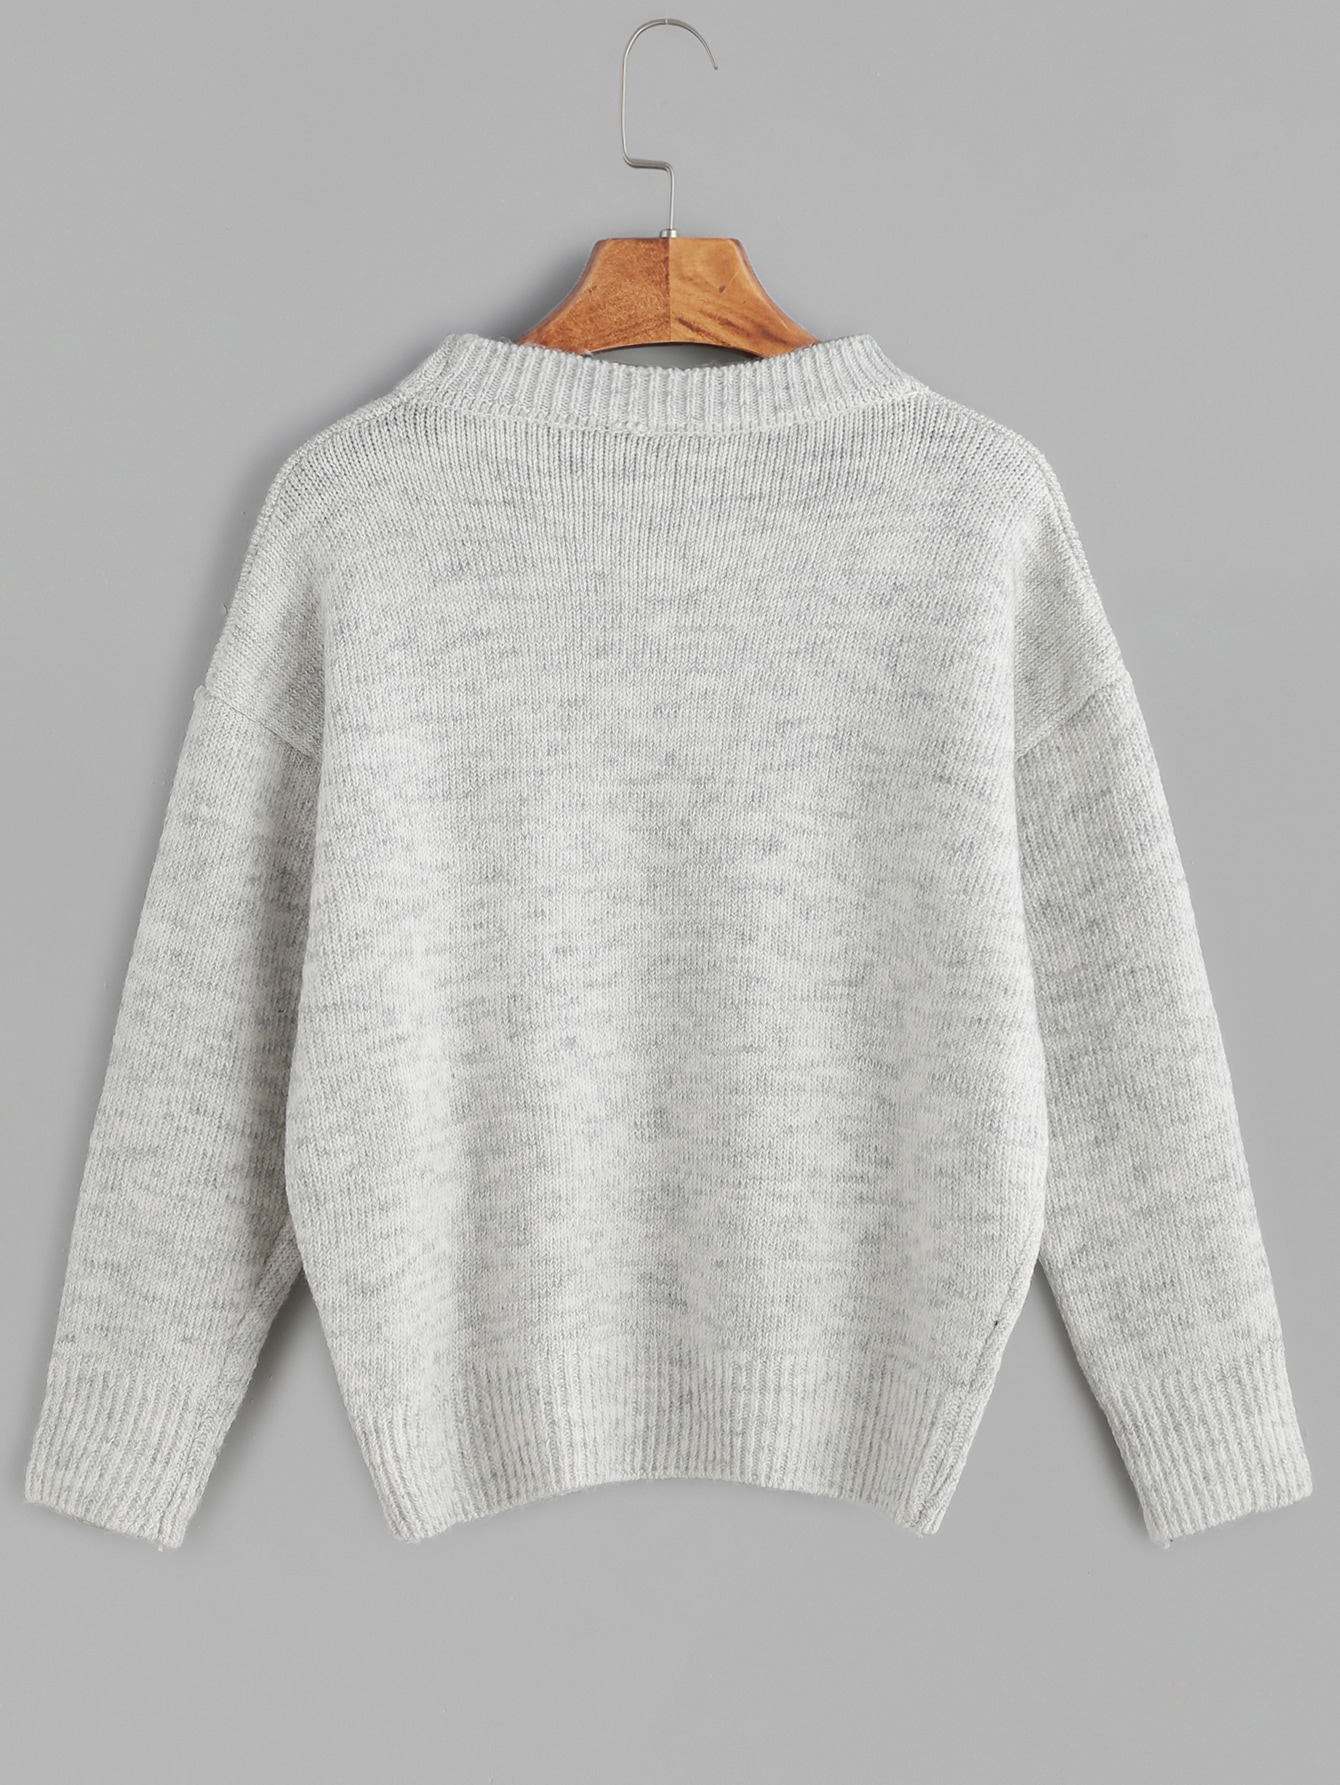 sweater161104102_2